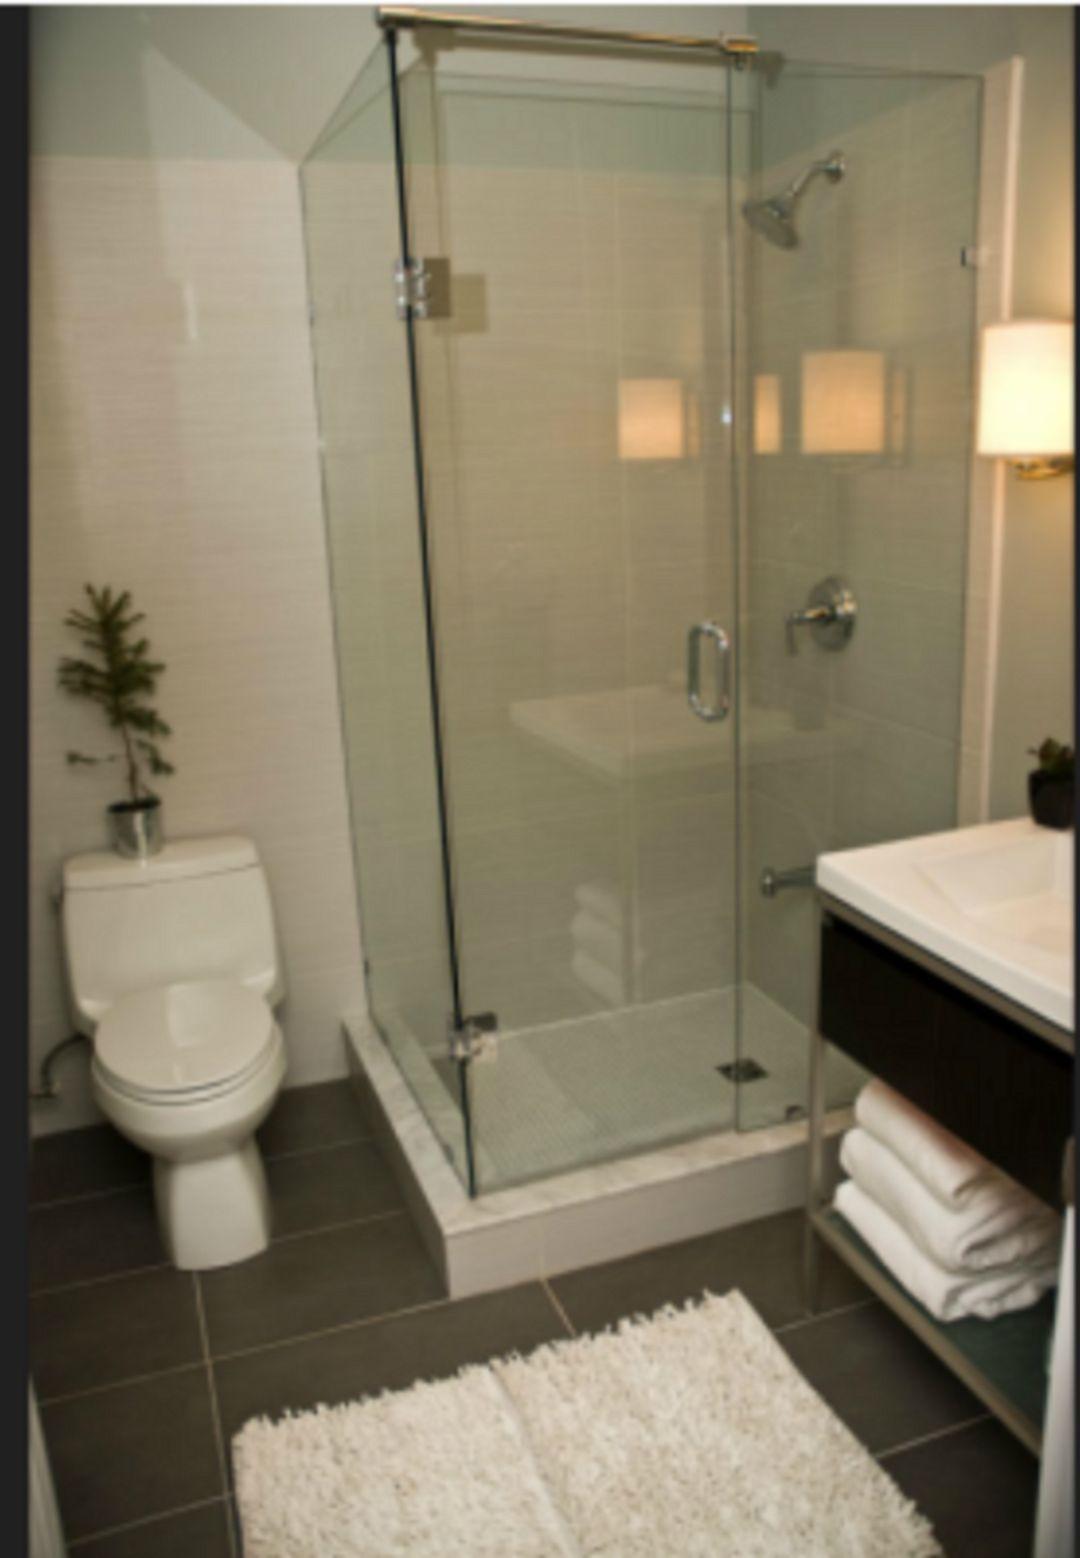 The Best 175 Best Modern Bathroom Shower Ideas For Small Bathroom Http Goodsgn Com Bathroom Basement Bathroom Design Small Bathroom Makeover Small Bathroom